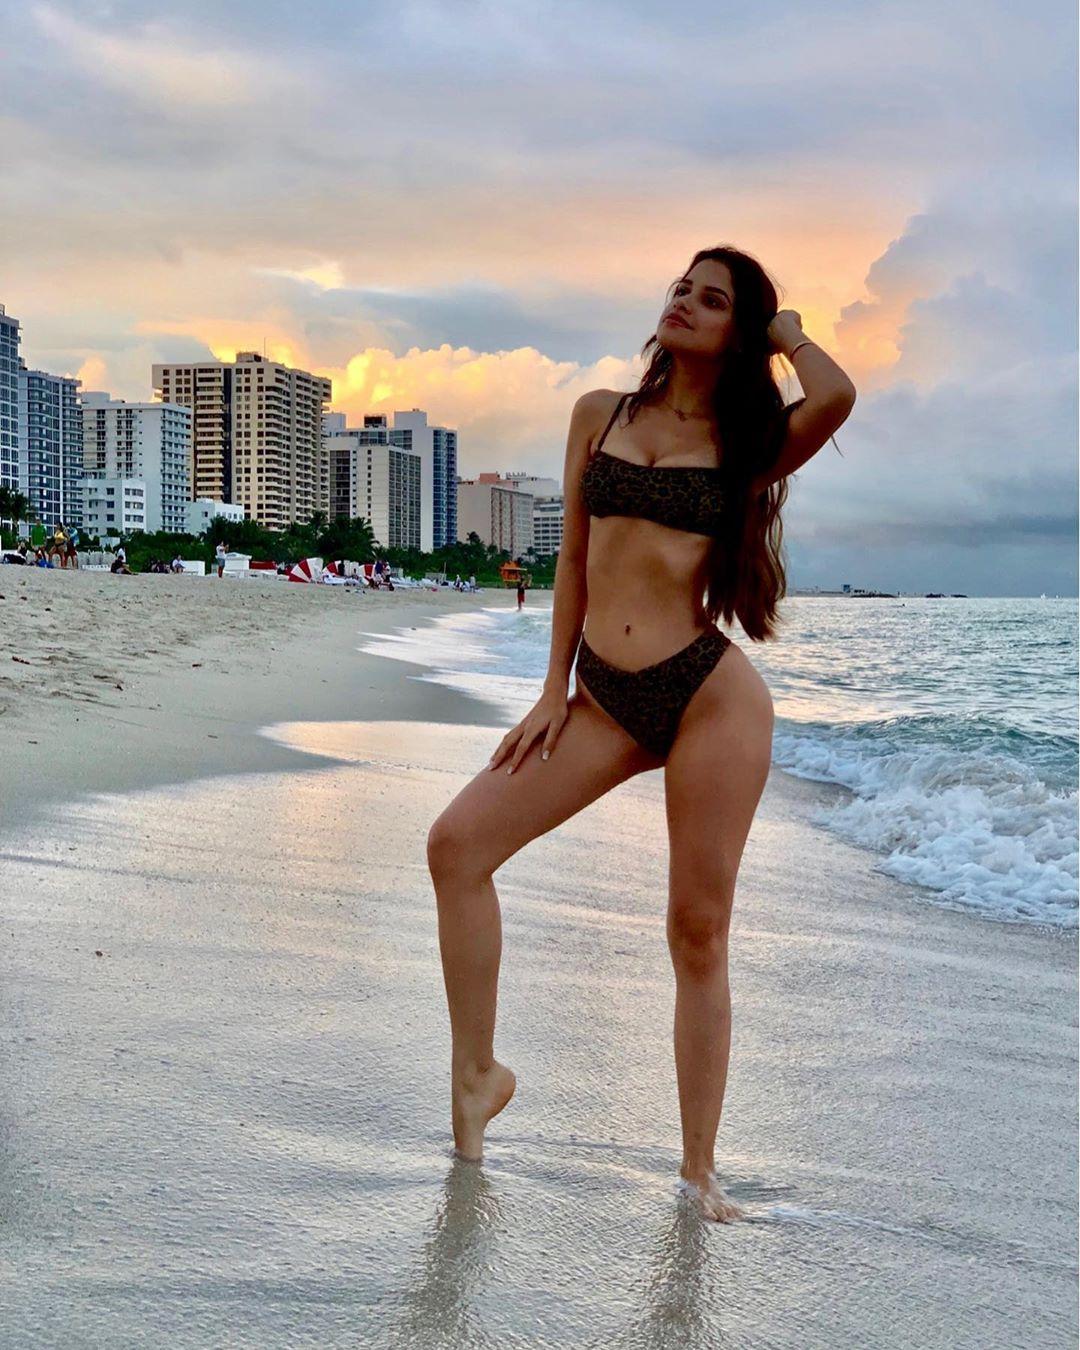 angella escudero, miss world peru 2019. - Página 2 77021110